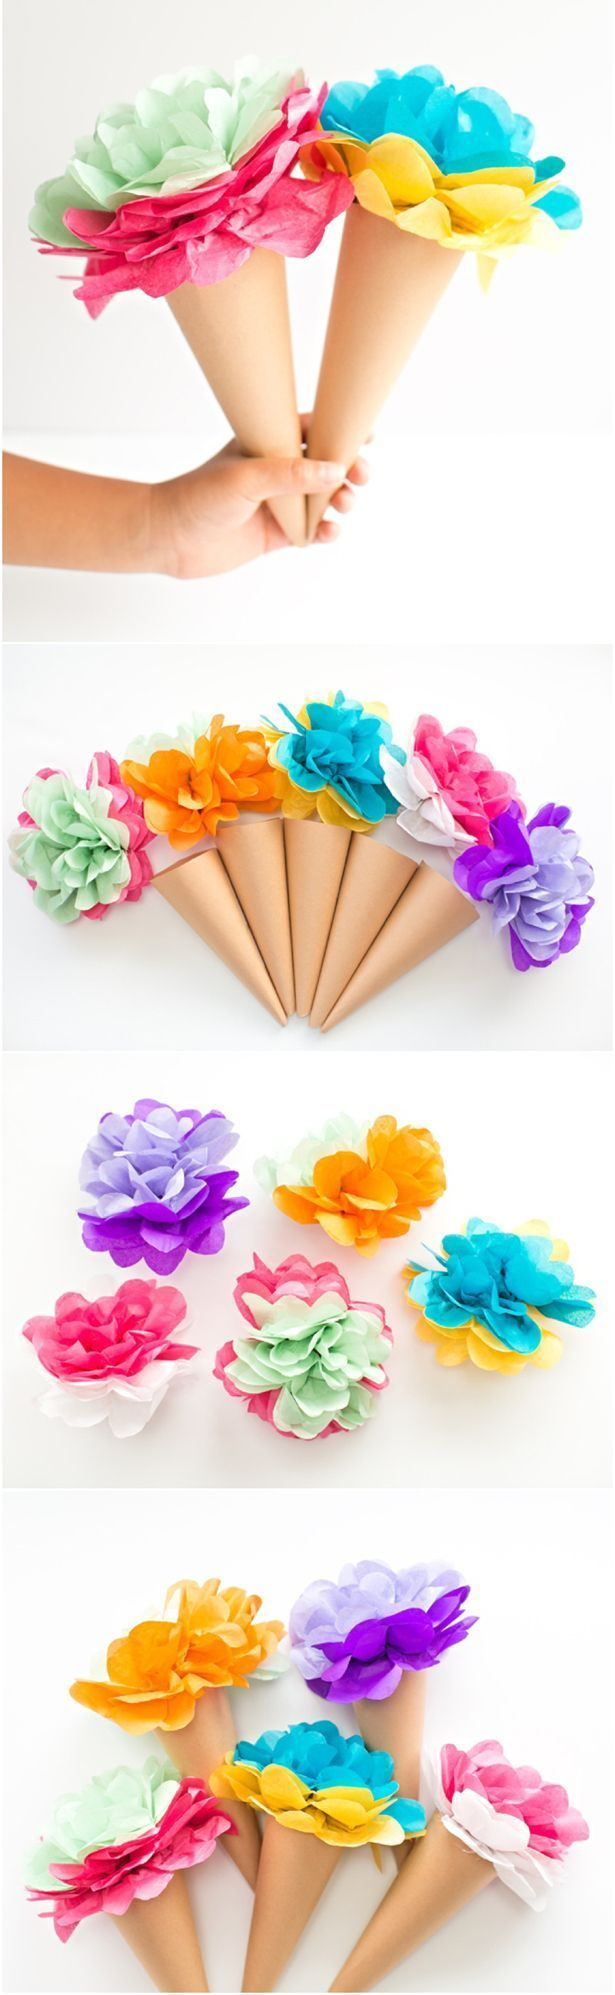 Make Tissue Paper Ice Cream Cone Flowers Pinterest Ice Cream